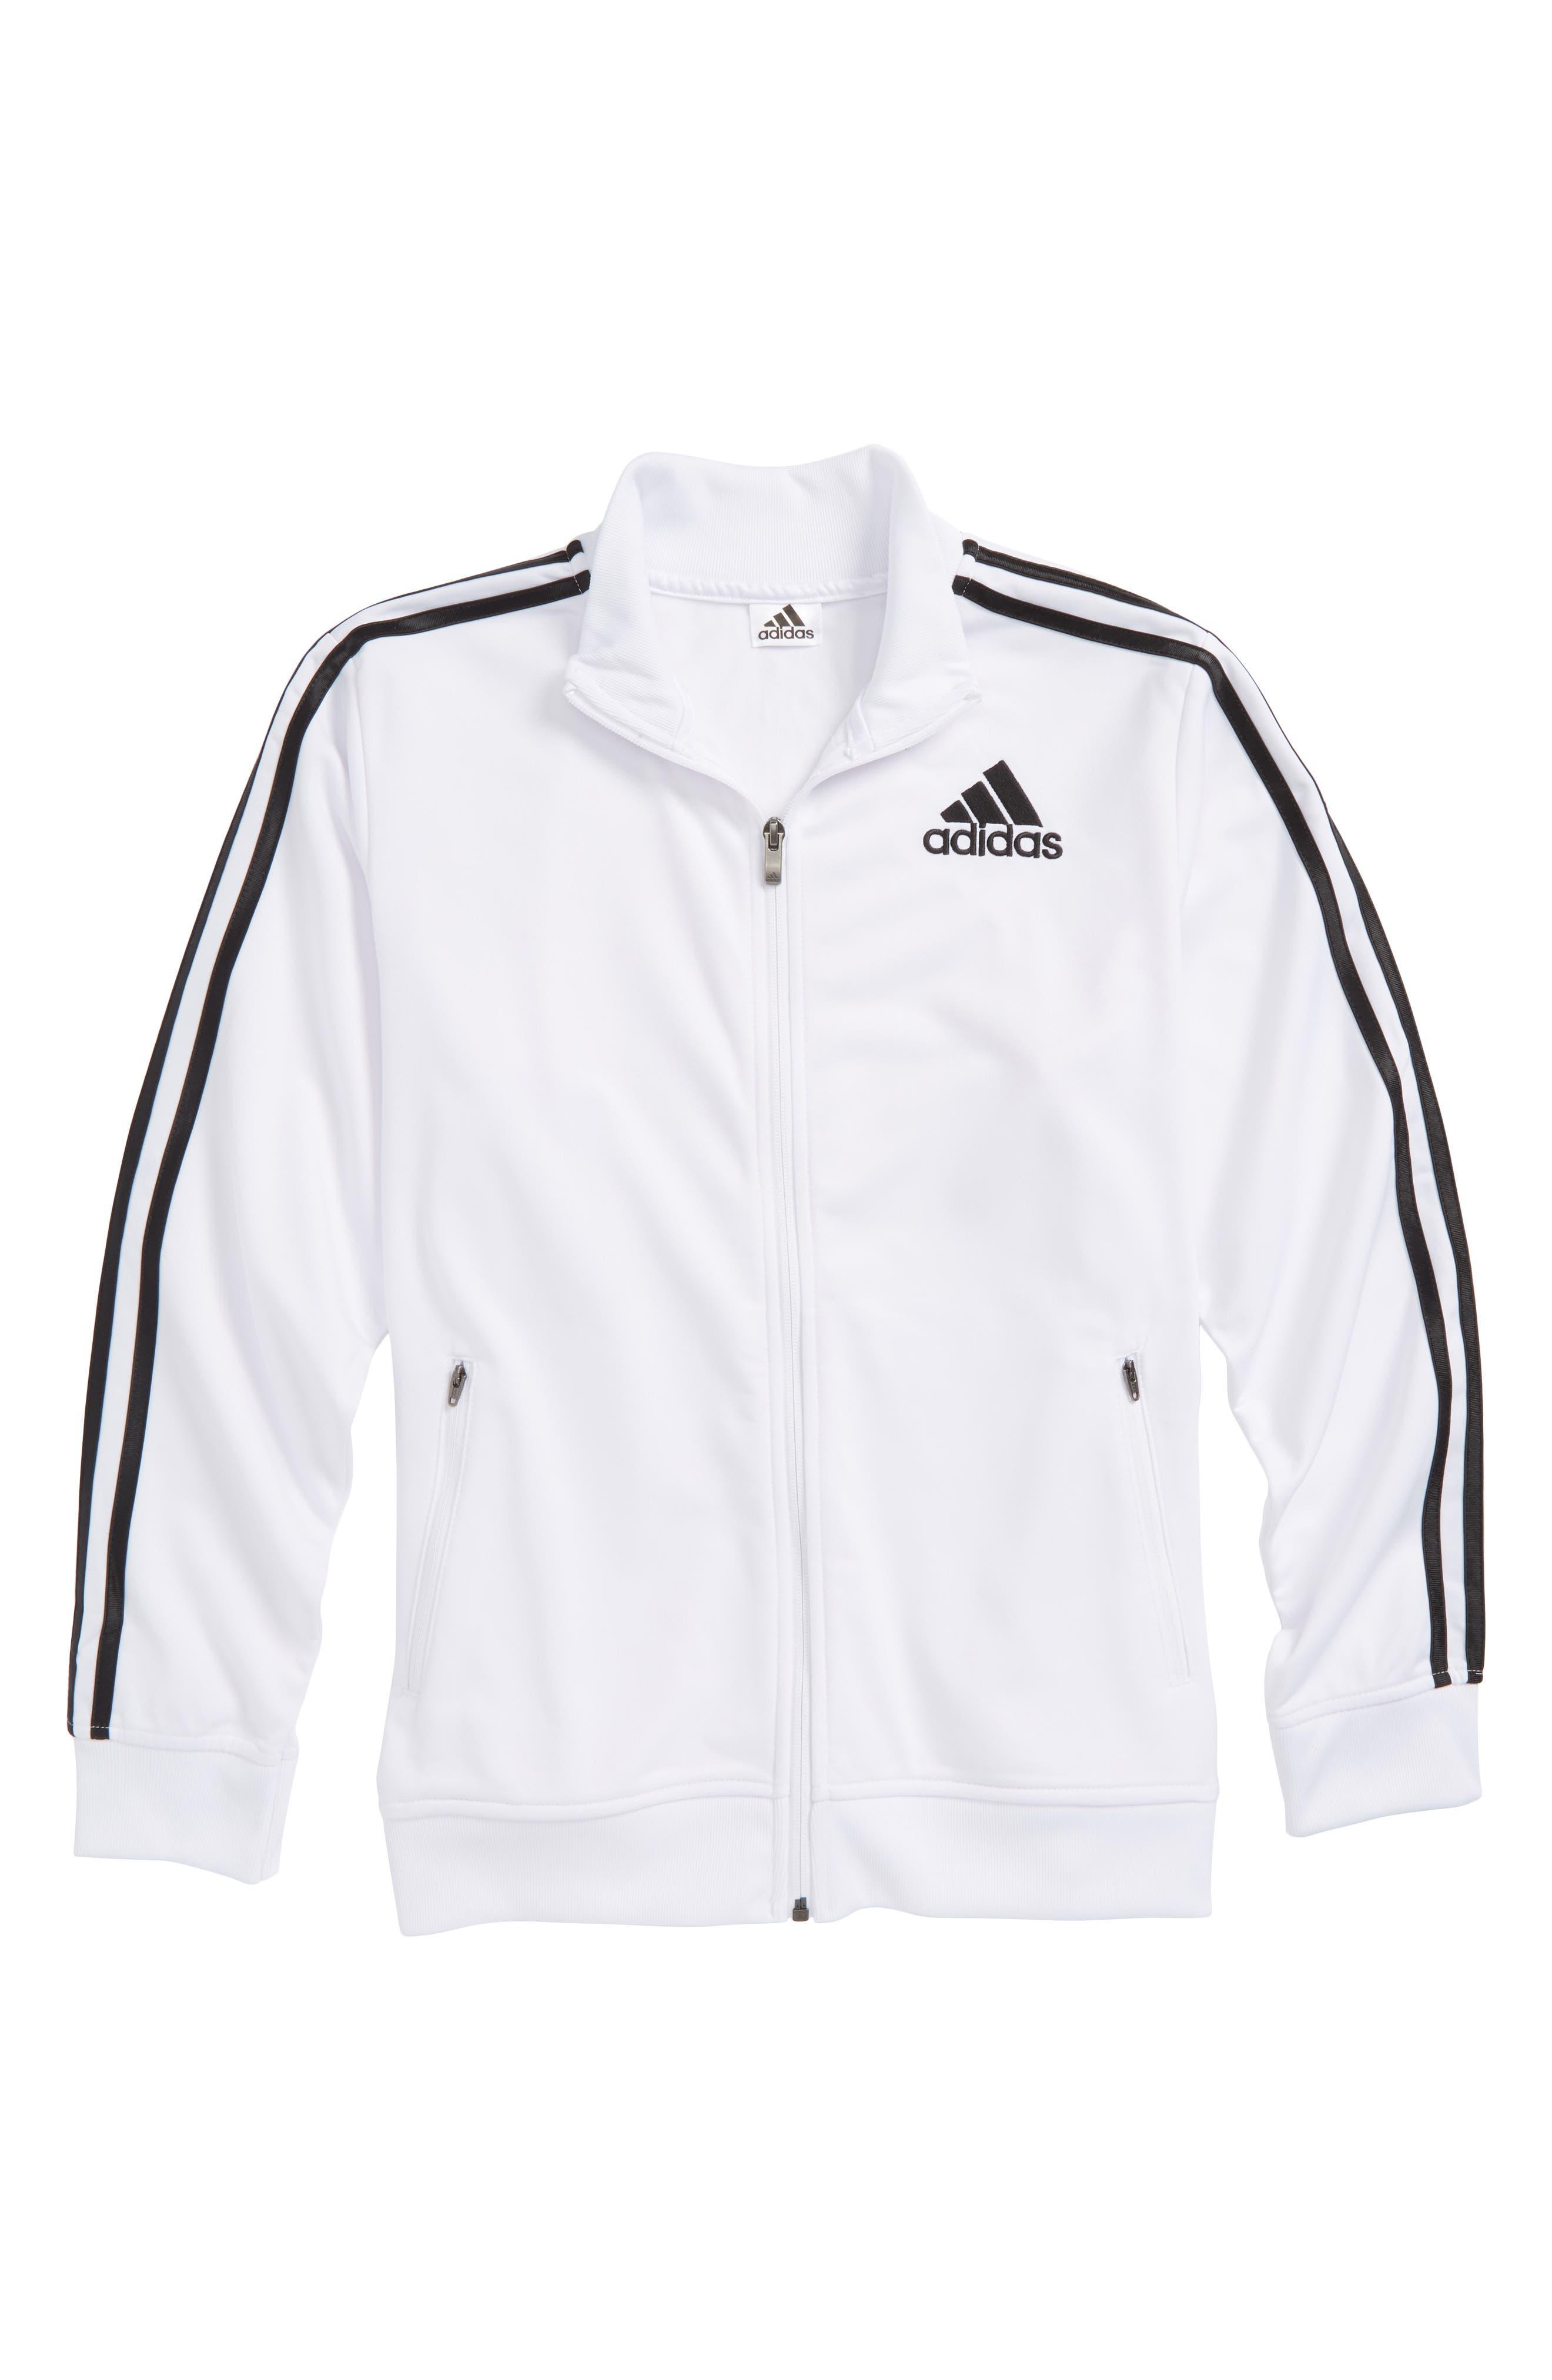 Co-Ed Designator Jacket,                         Main,                         color, White/ Black